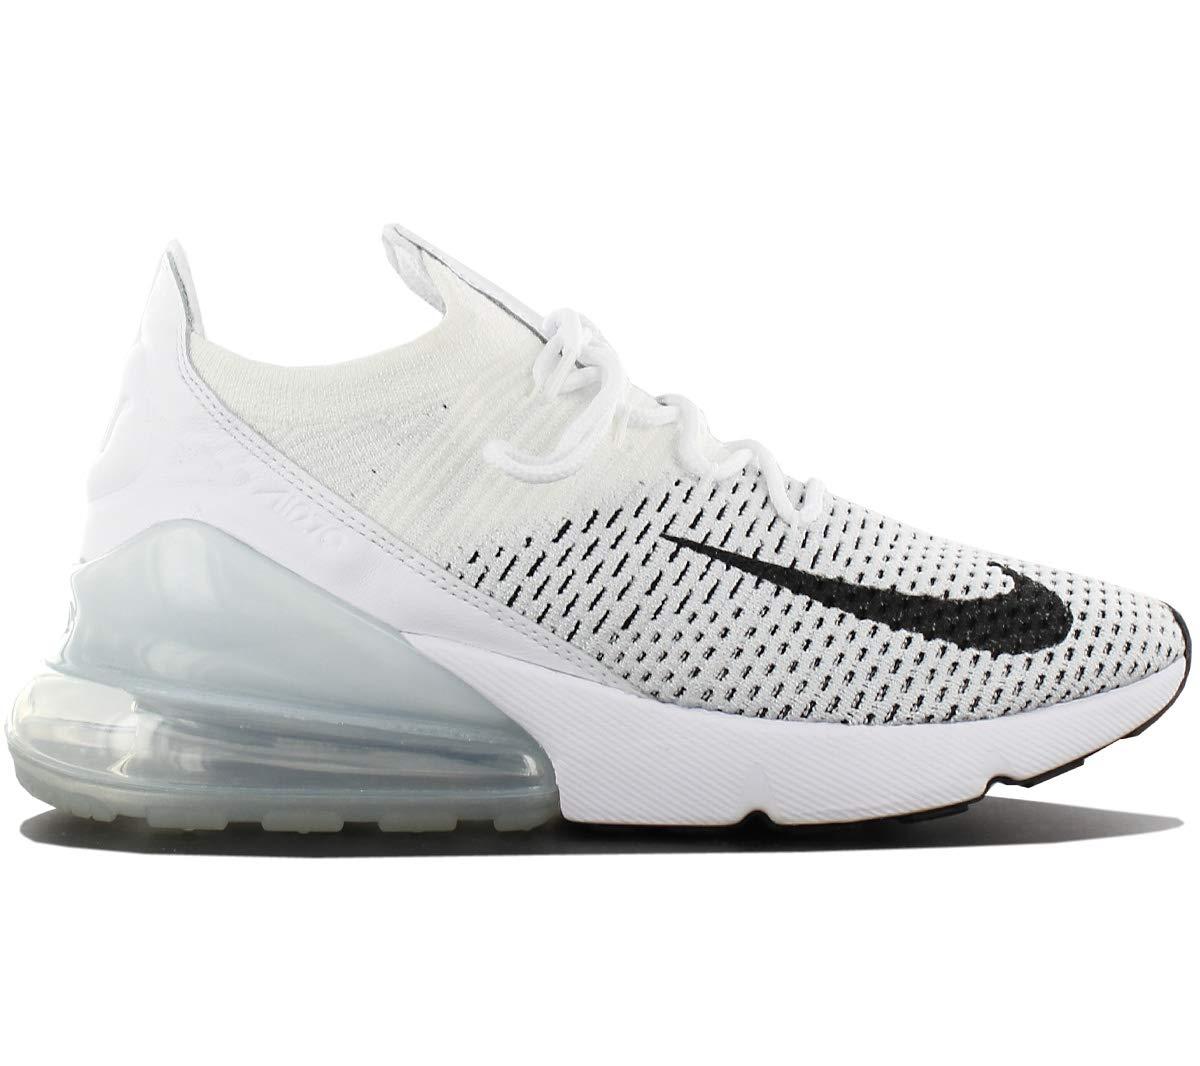 the latest 732e4 65a6e Nike Air Max 270 Flyknit Women's Shoes White/Black ah6803-100 (9 B(M) US)